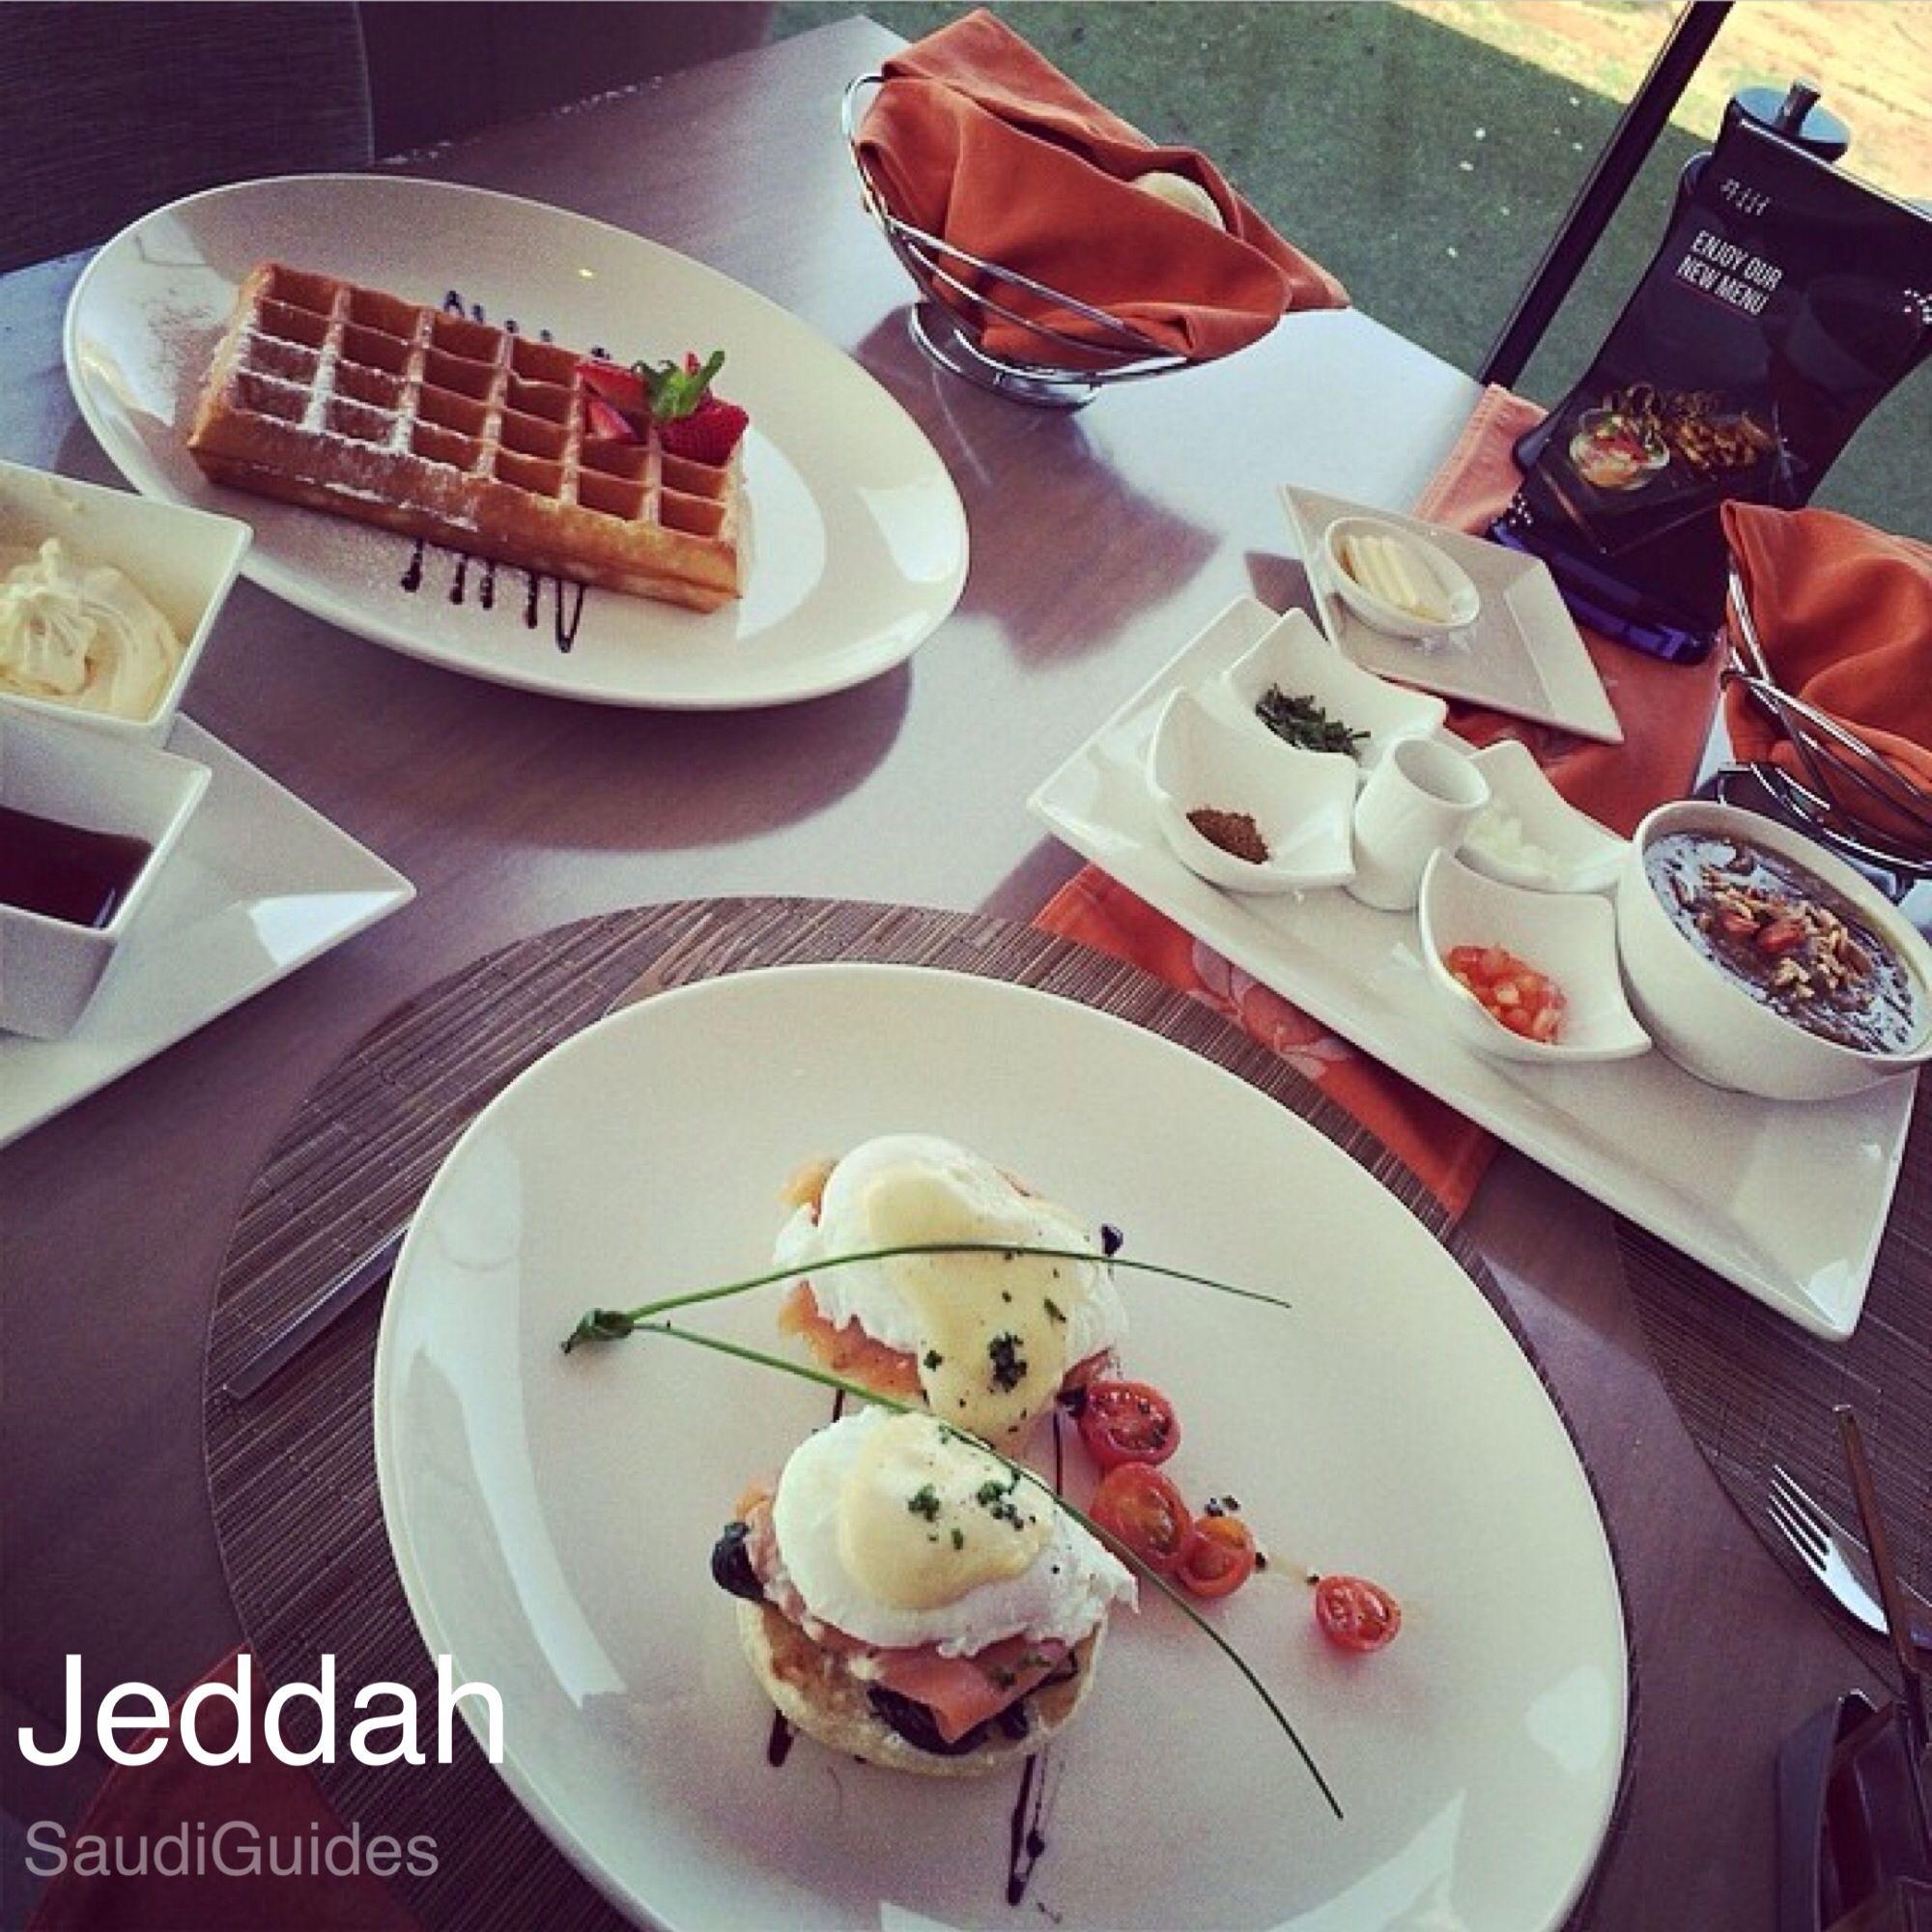 #فطور جميل من #جدة ❤️ اسم المطعم: أمارا Amara الموقع: كورنيش جدة تصوير @todieforcouture مين جربه وايش أحلى #مطاعم فطور في #جده ؟ Restaurant Name: Amara Location: Jeddah Cornish Did you try it what is the best #breakfast places in #Jeddah ☕️ #SaudiGuides http://instagram.com/p/oqfvZVHObC/